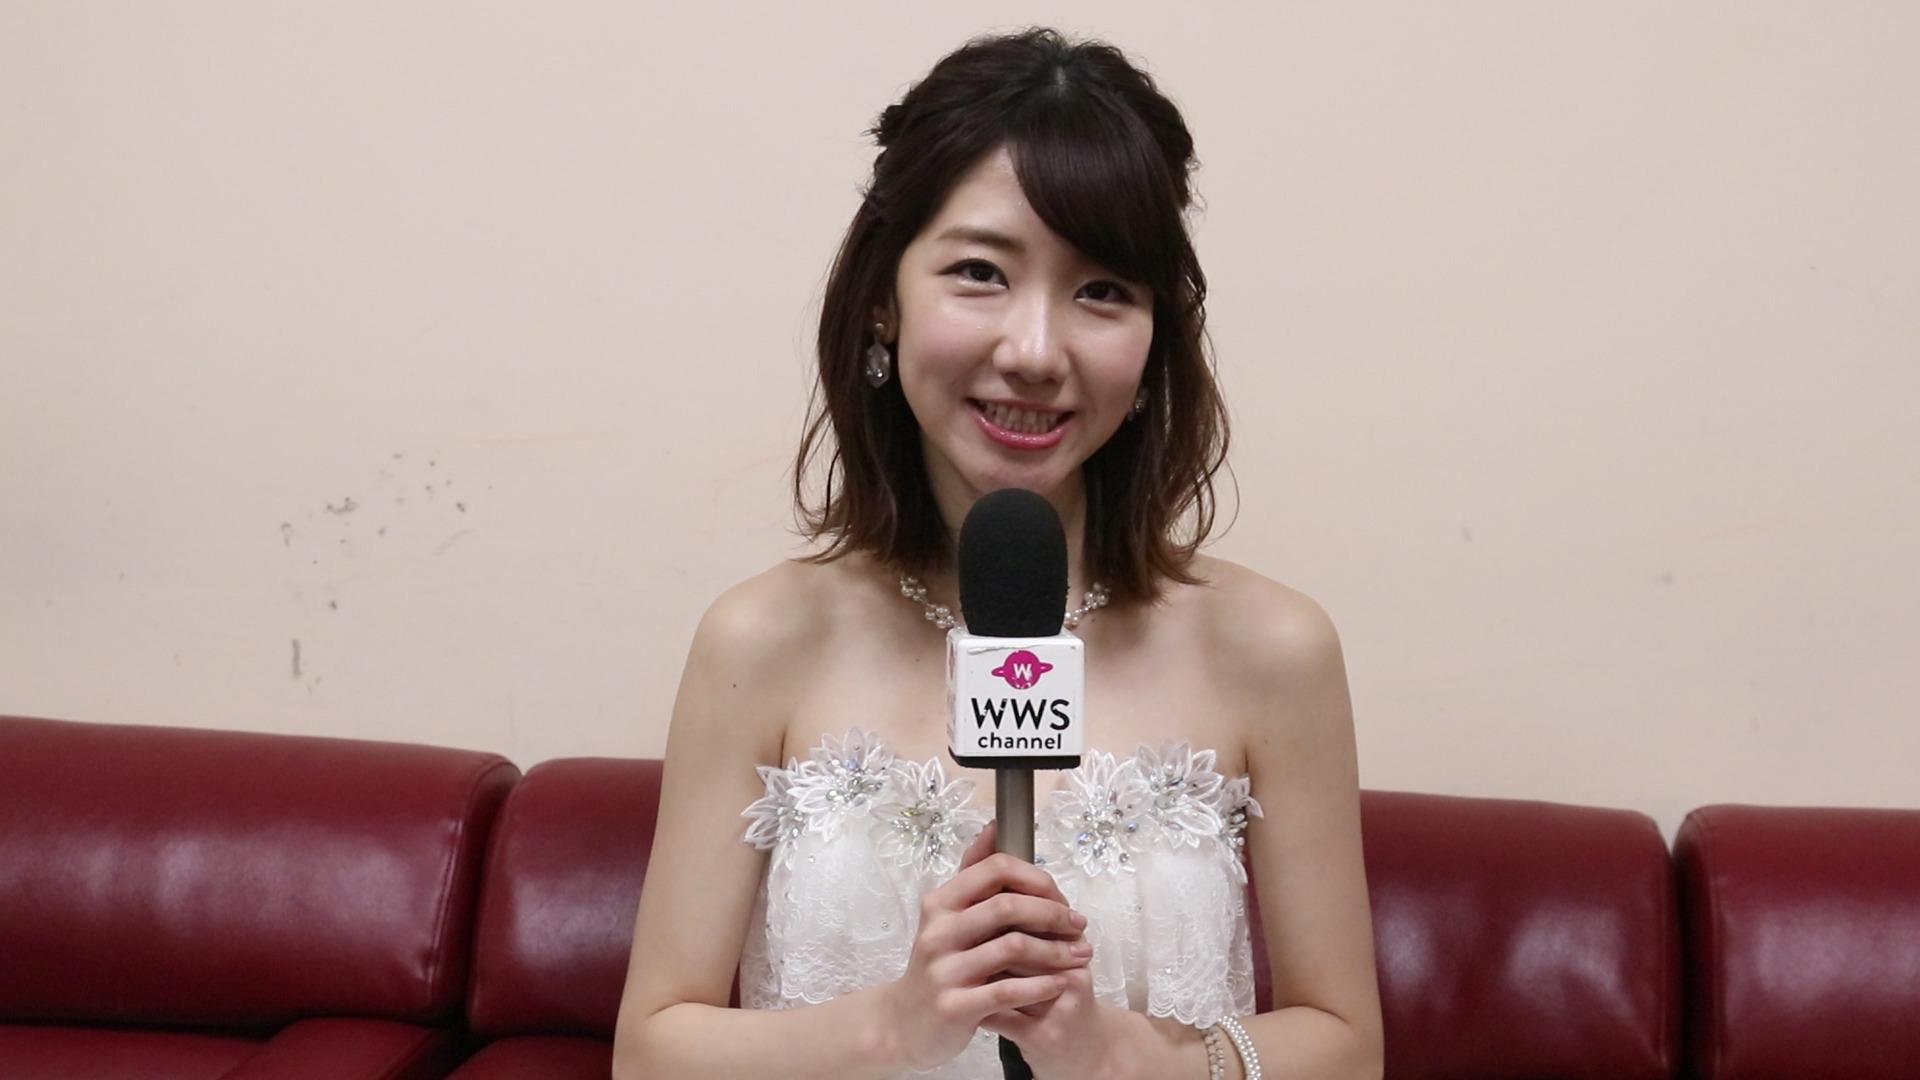 AKB48・柏木由紀に「Thank You Disney Live 2018」 でインタビュー!「この前上海のディズニーランドに行ったばかり」